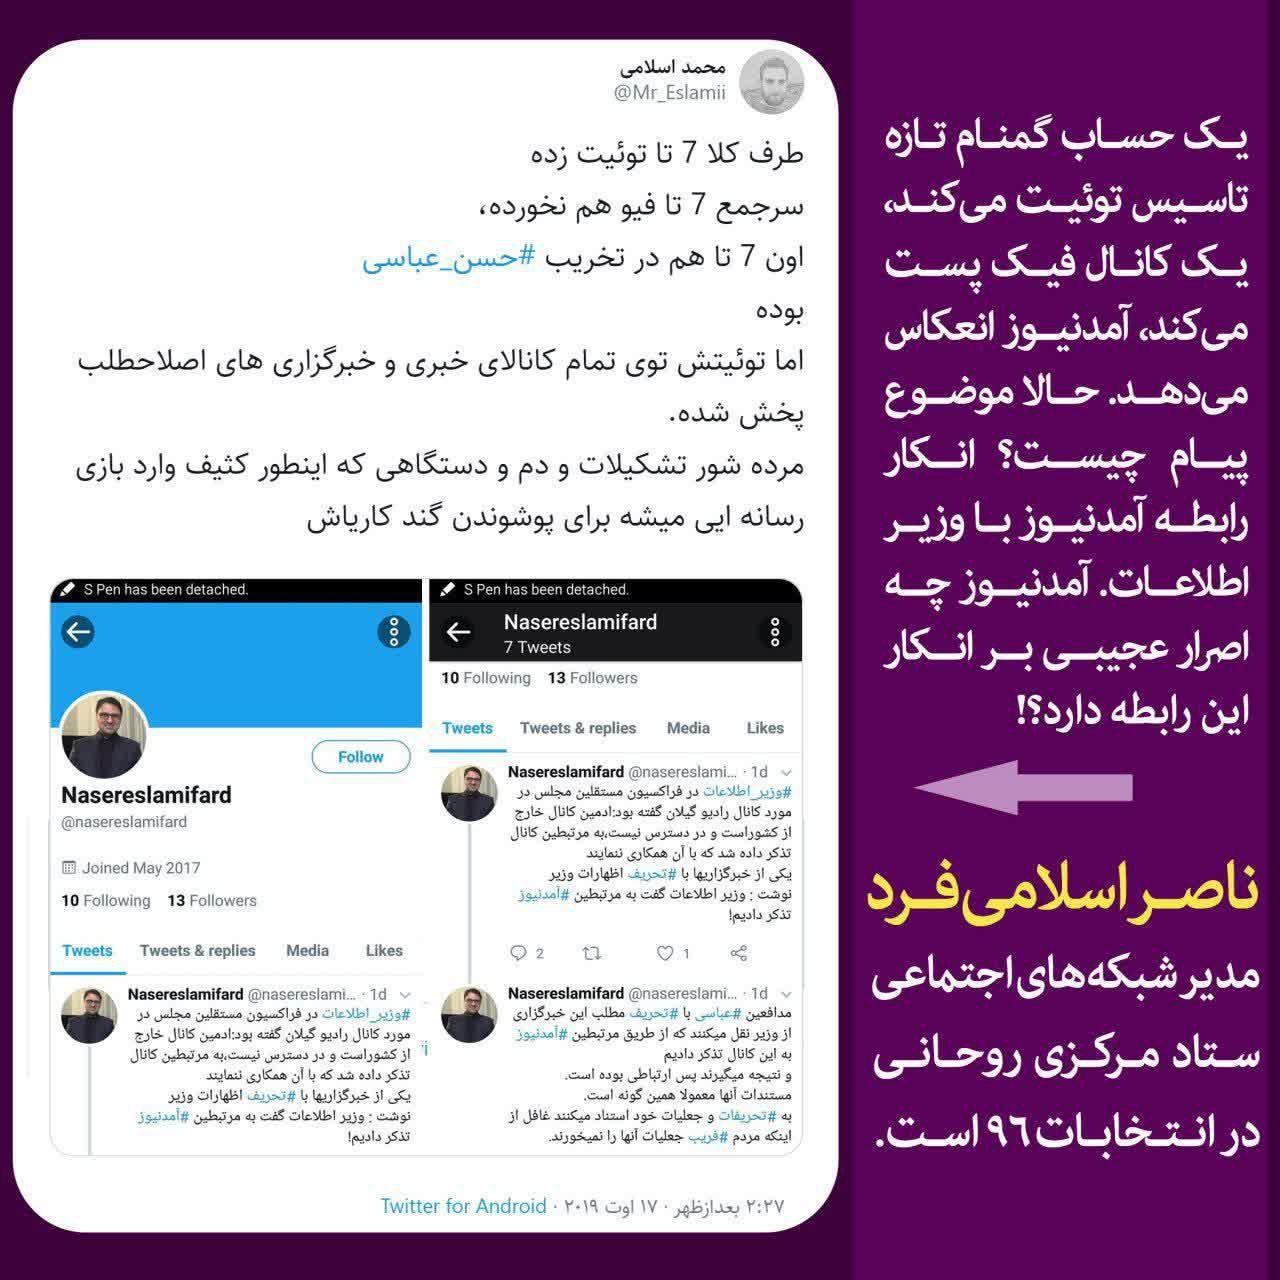 eslamifard%20%283%29 یک حساب گمنام جديد و تو و تازه تاسیس توئیت میکند، آمدنیوز انعکاس میدهد